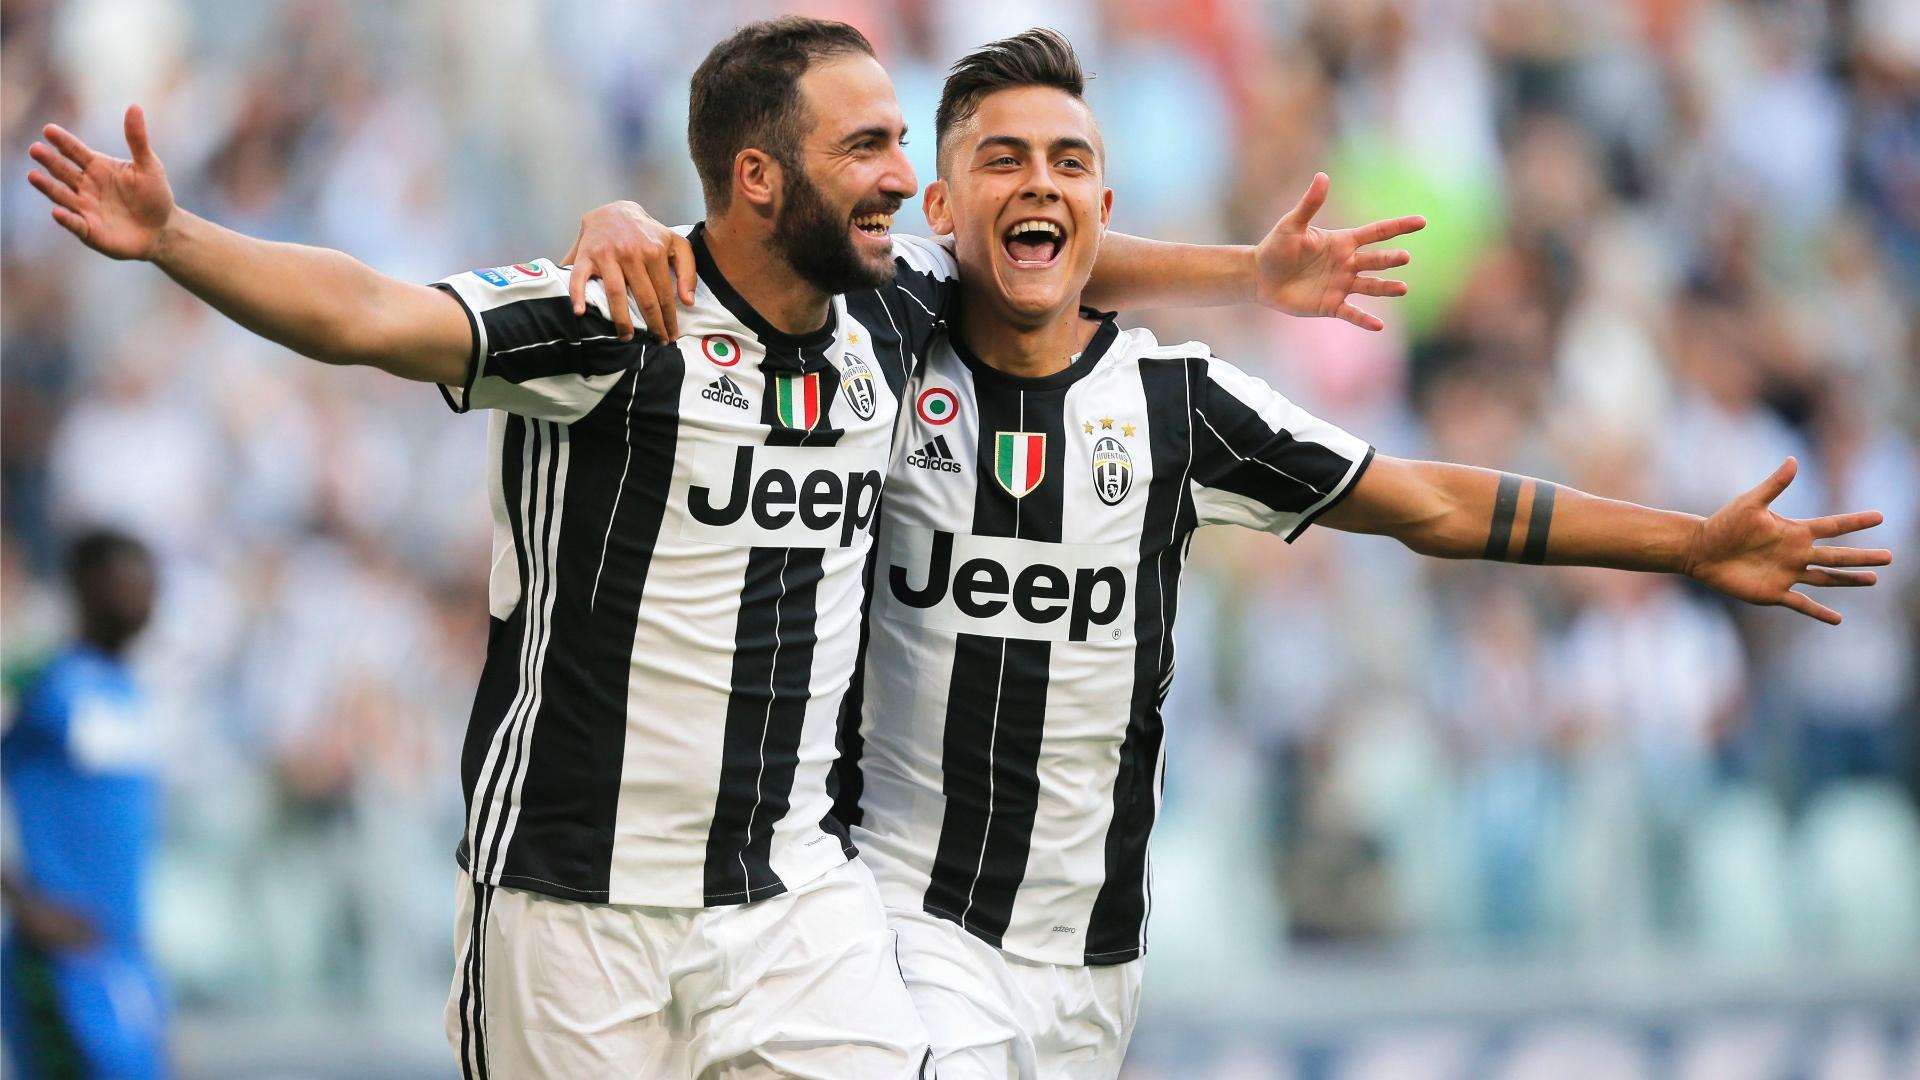 Juventus High Definition Wallpapers